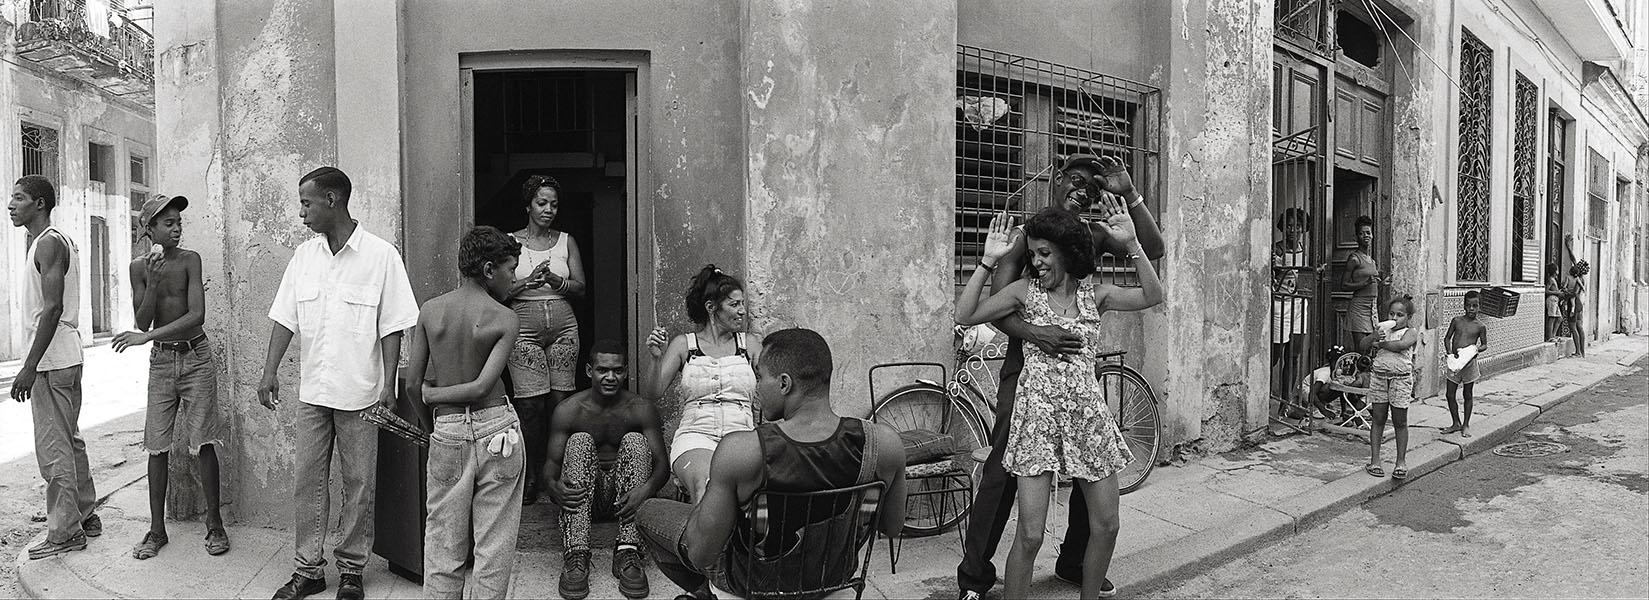 Centro Habana, Cuba. (1999) - Juan Miguel Alba Molina